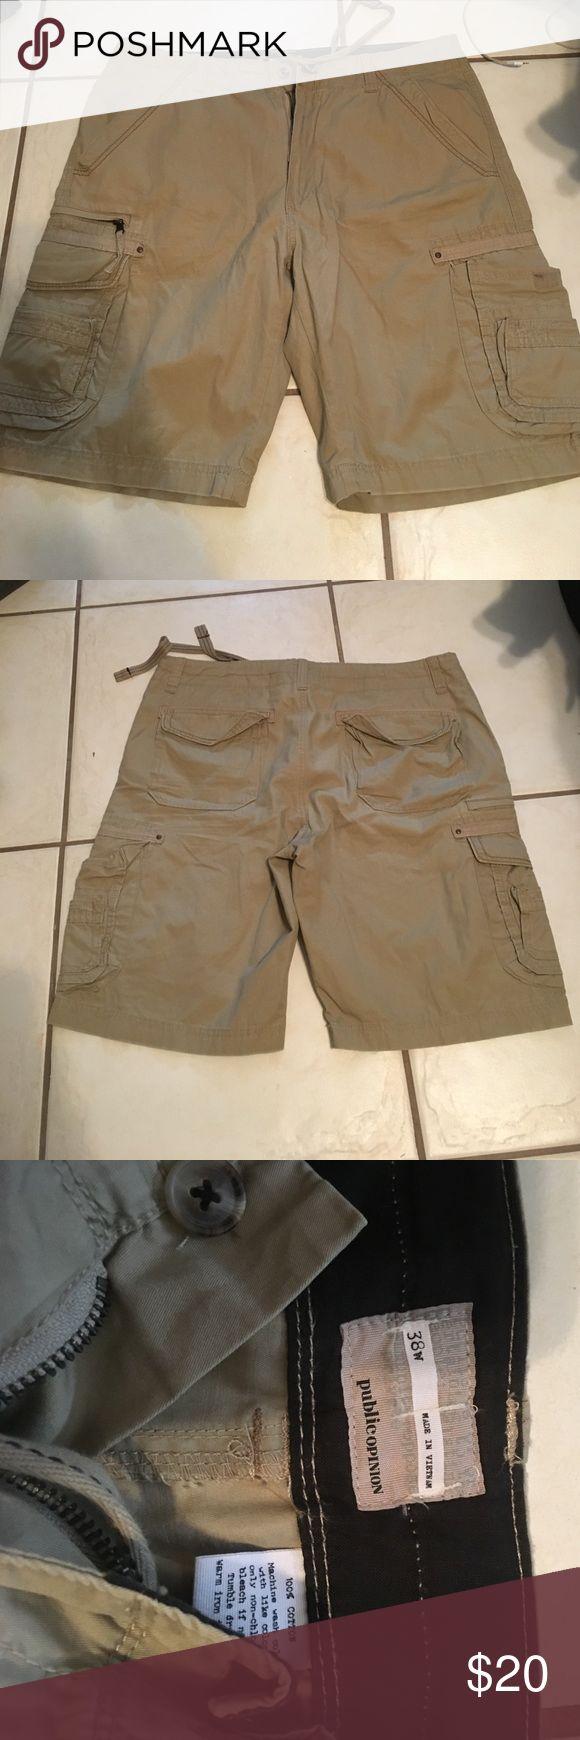 Public Opinion khaki cargo shorts Perfect condition! Size 38 public opinion Shorts Cargo